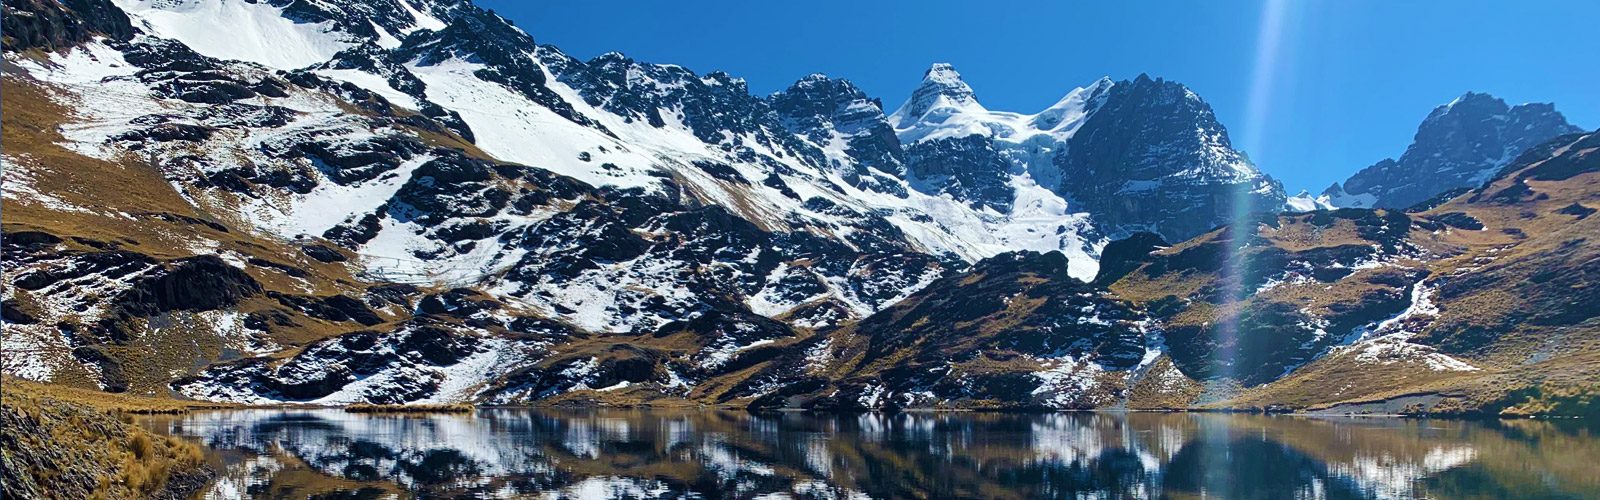 trekking-bolivia-tres-cordilleras